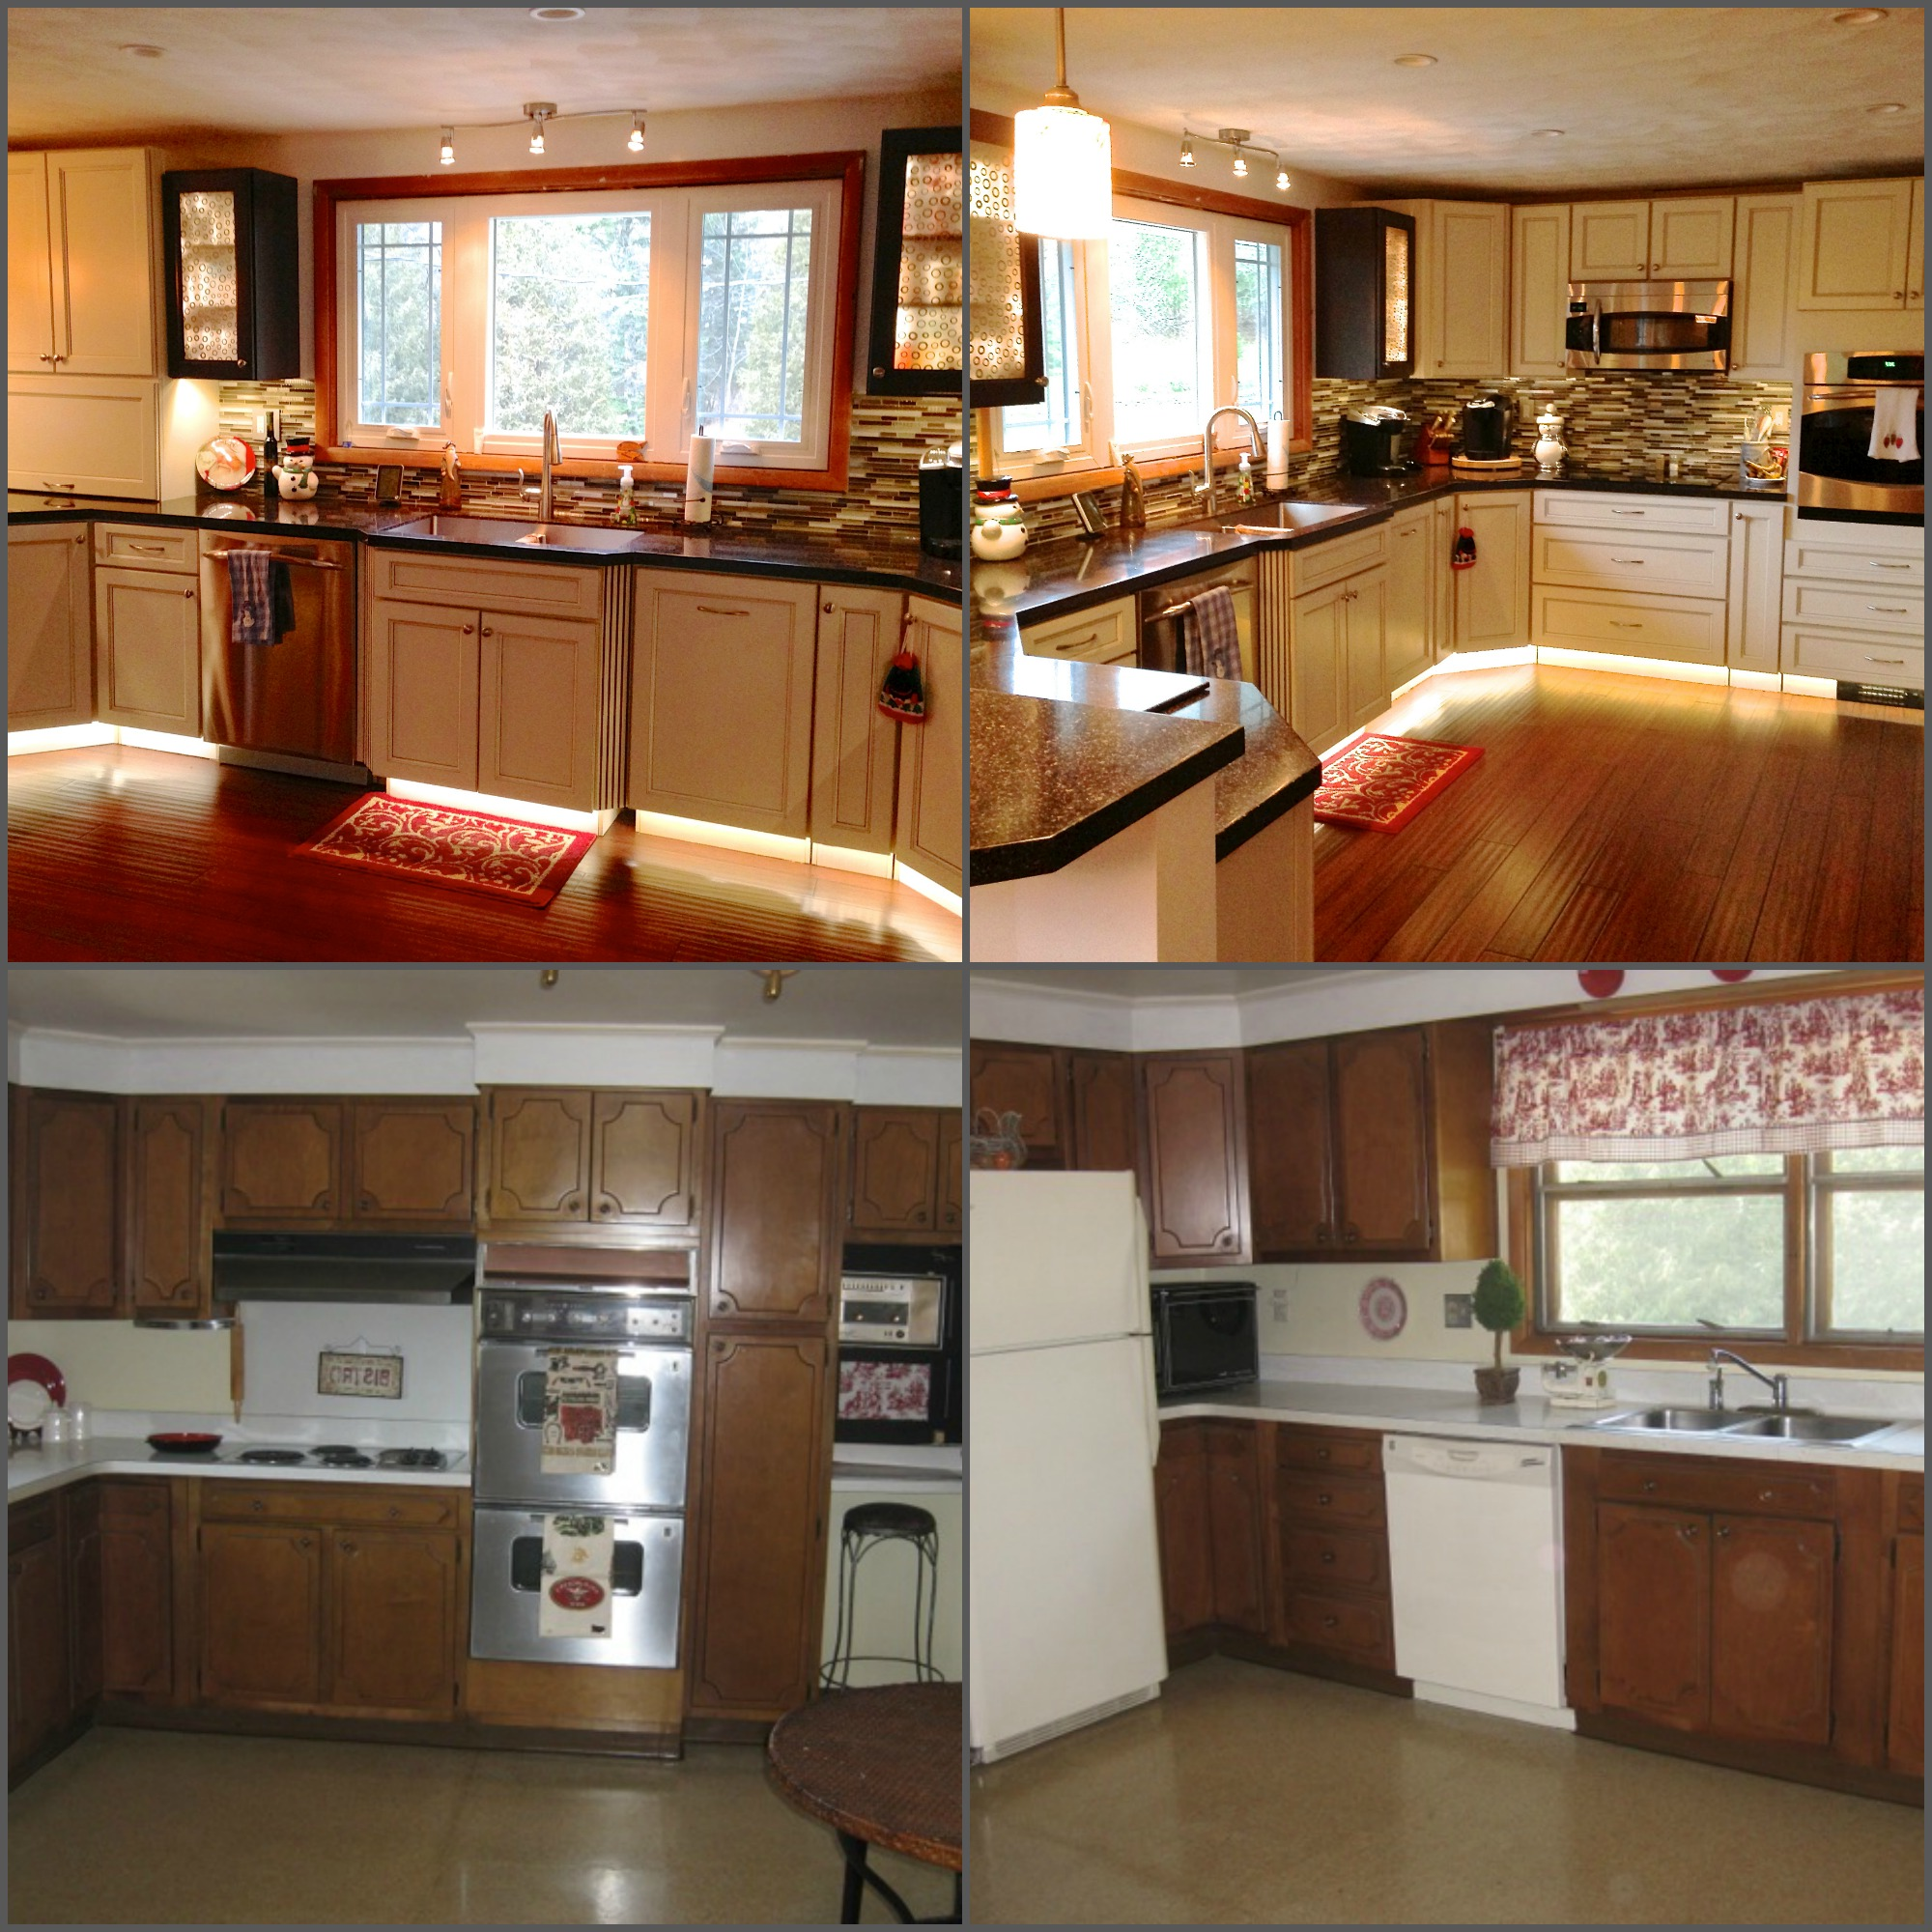 Older Home Kitchen Remodeling Ideas   Roy Home Design on Small:_Tken7Avcza= Kitchen Renovation Ideas  id=18669